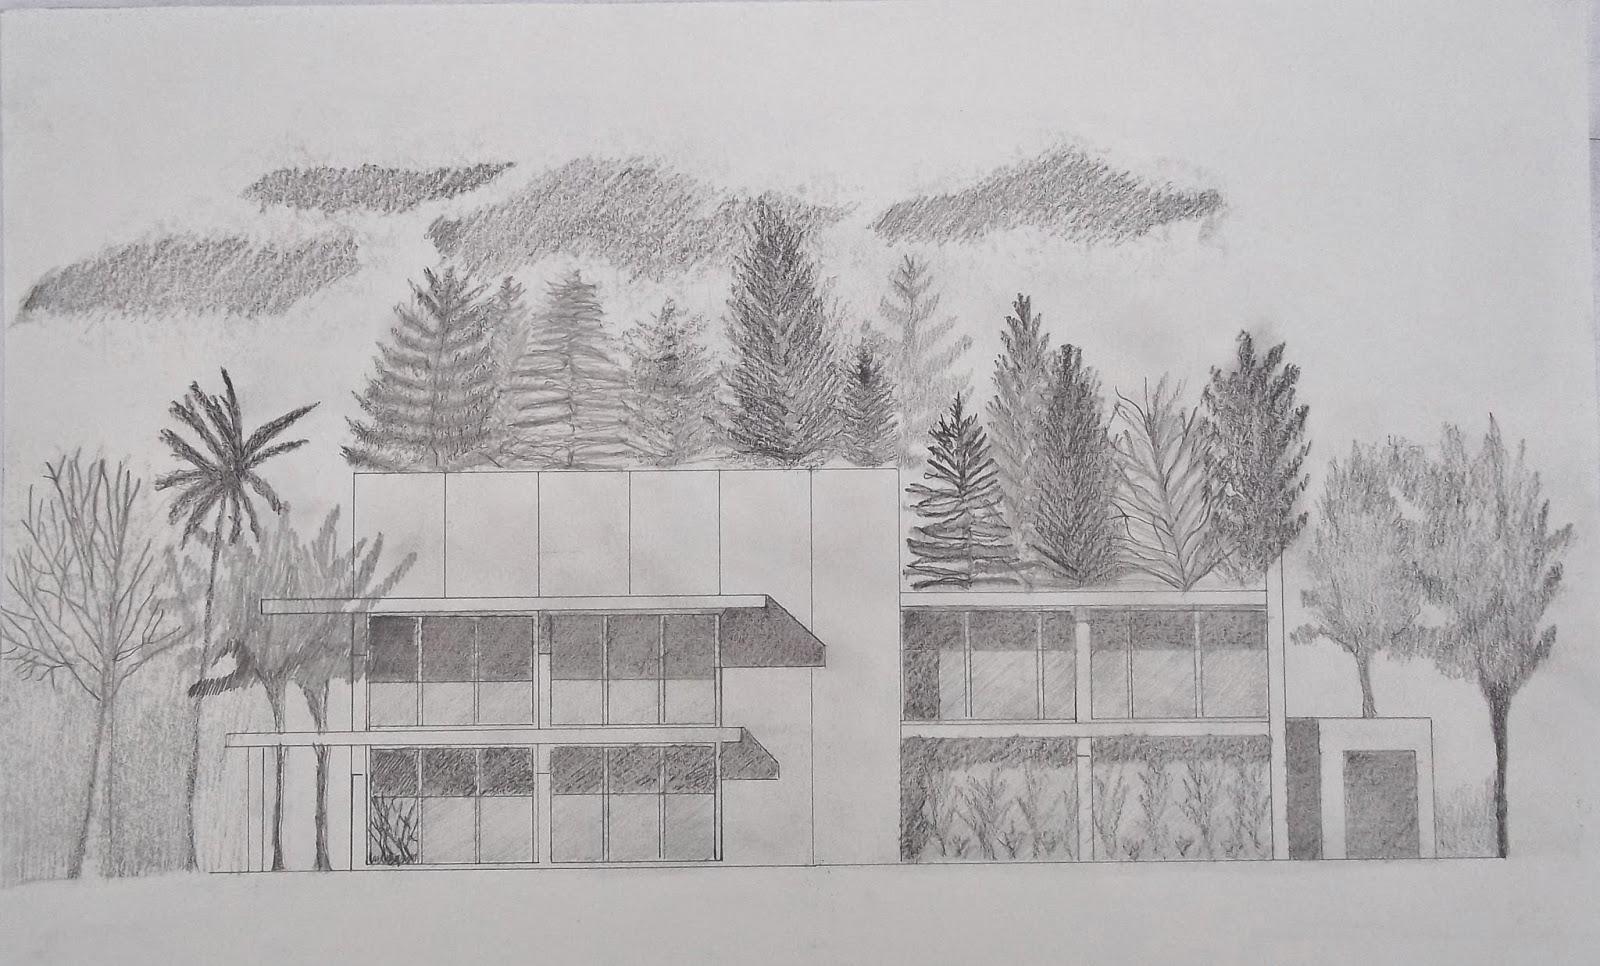 Arquitectura y dise o ambientaci n con l piz - Casas dibujadas a lapiz ...